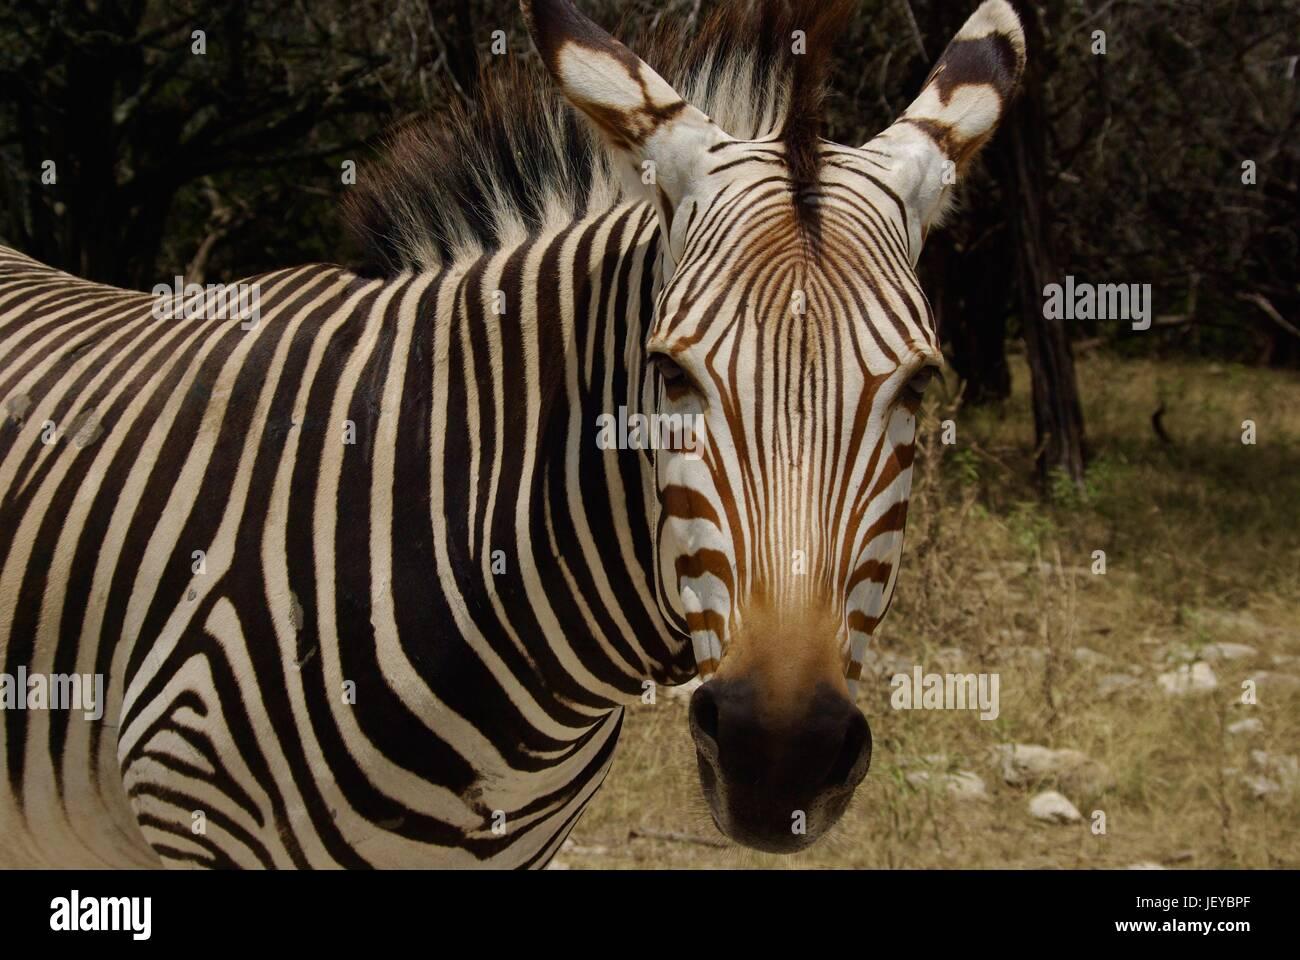 Staring Down a Zebra - Stock Image